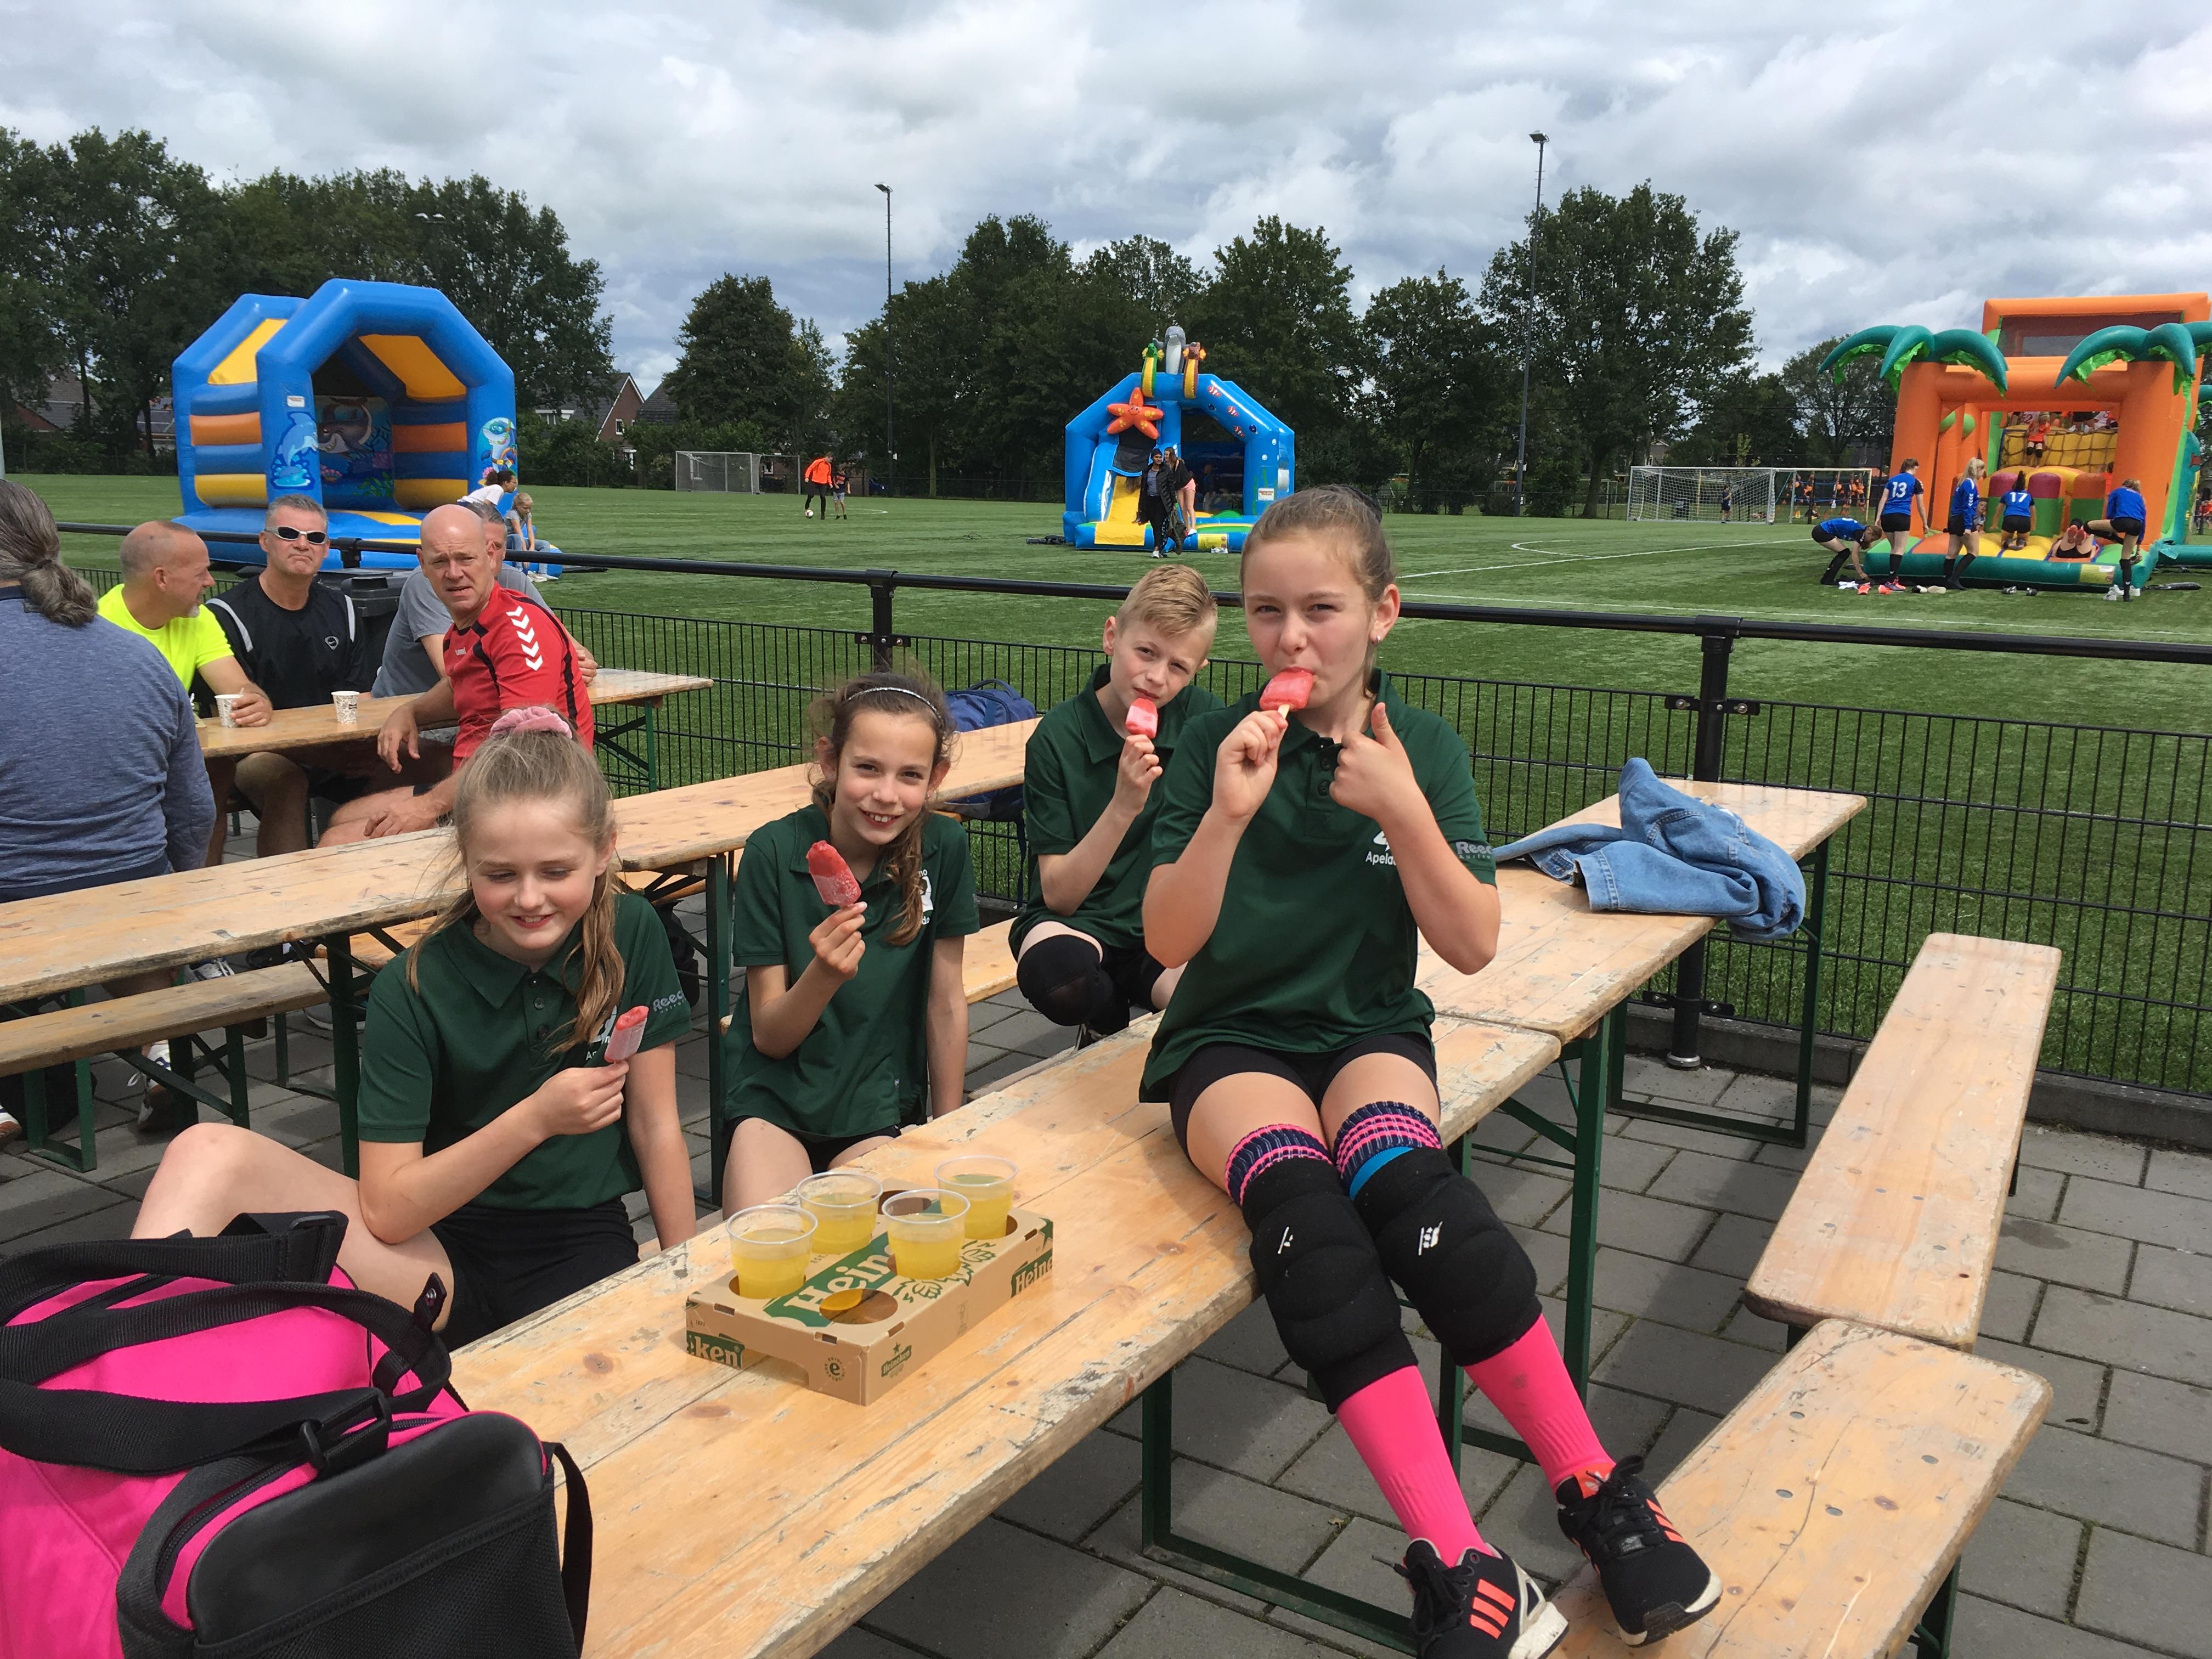 Volleybalvereniging Alterno Apeldoorn